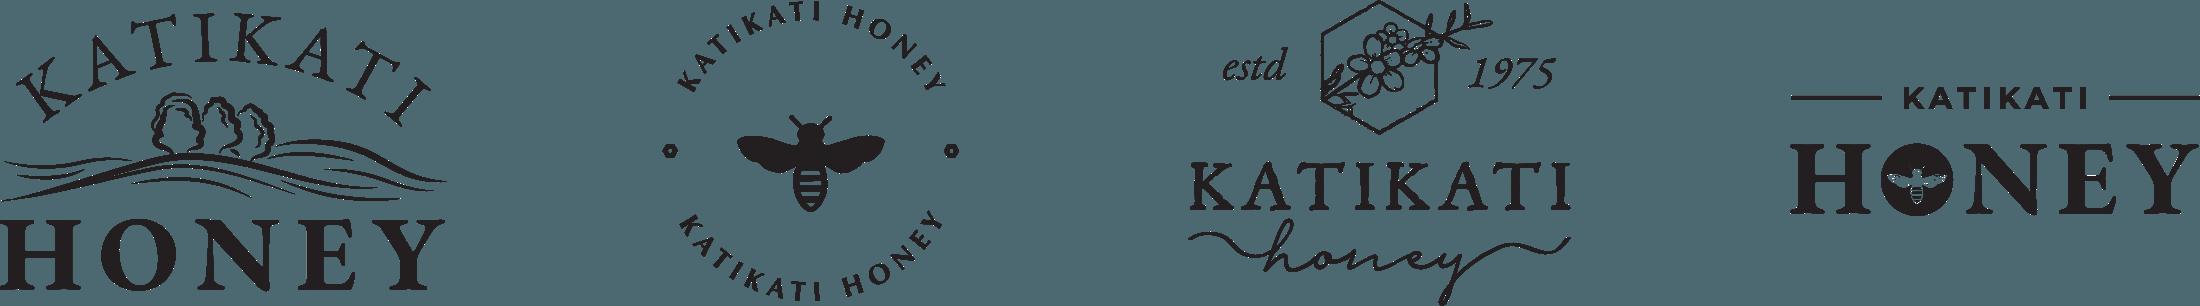 Initial Logo Concepts - Katikati Honey